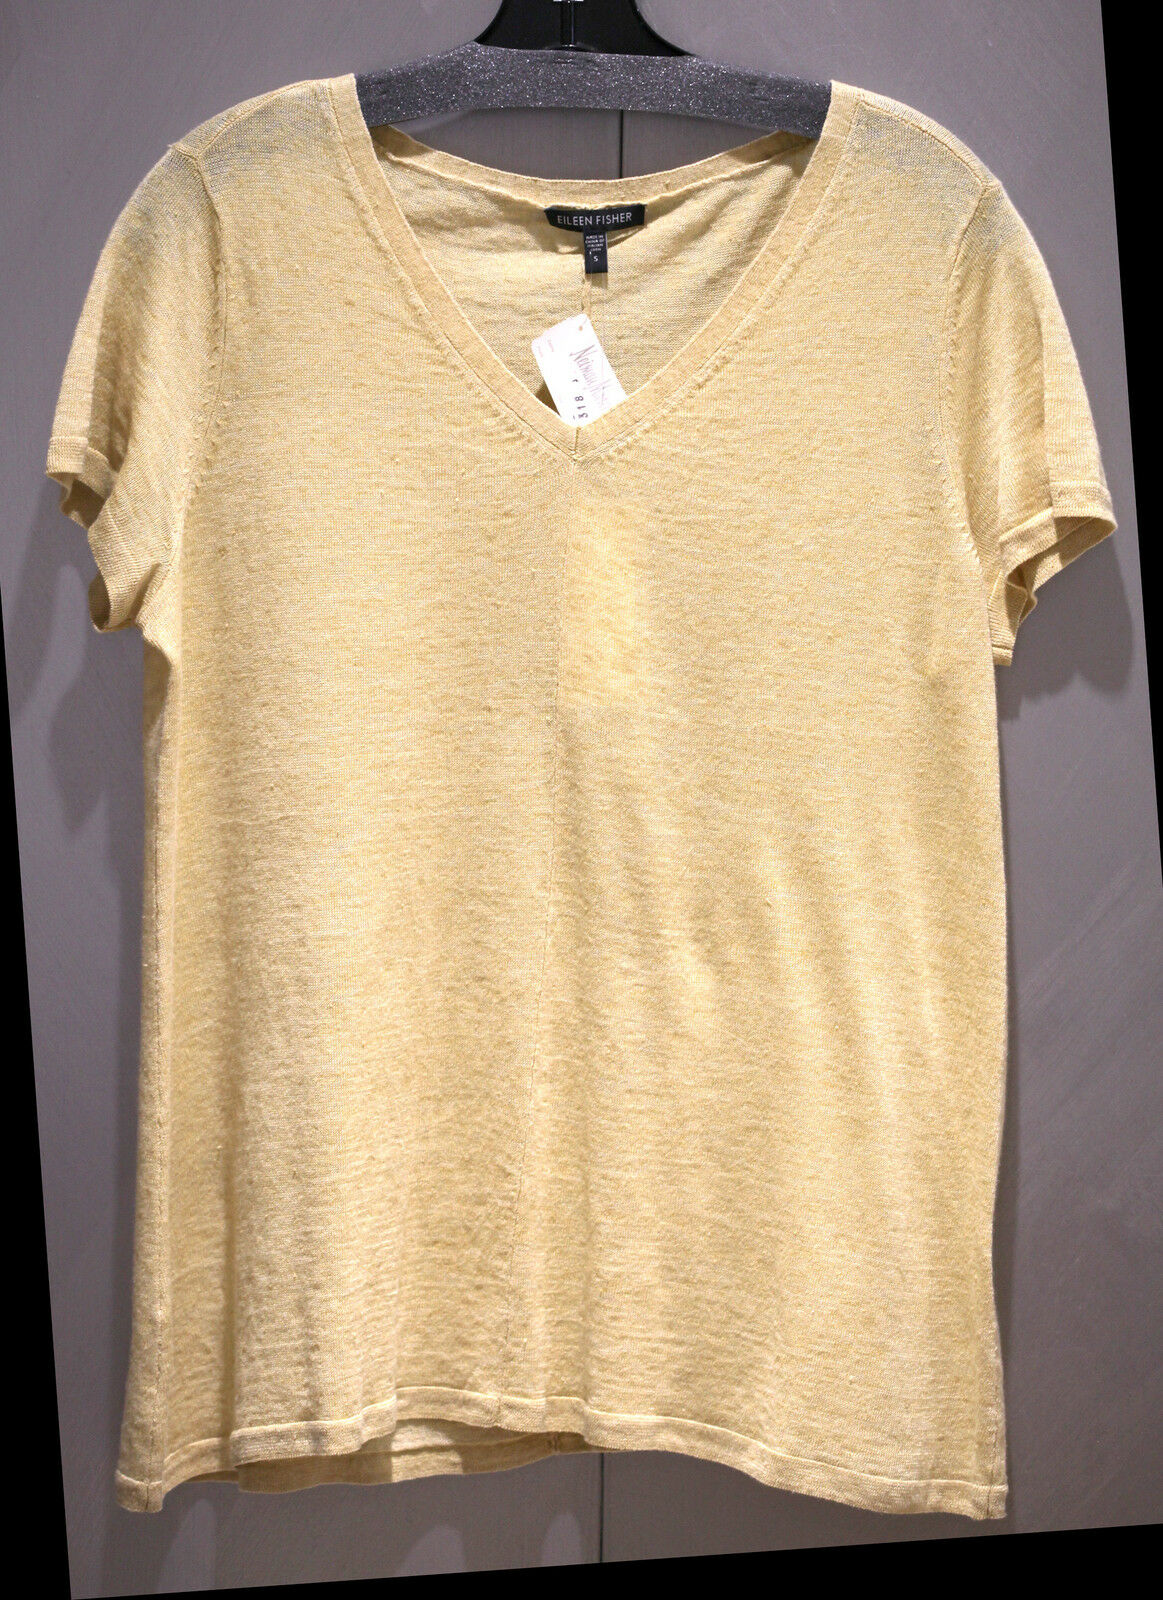 NWT Neiman Marcus Eileen Fisher 100% Fine Linen Gold Blouse Top  sz S FS